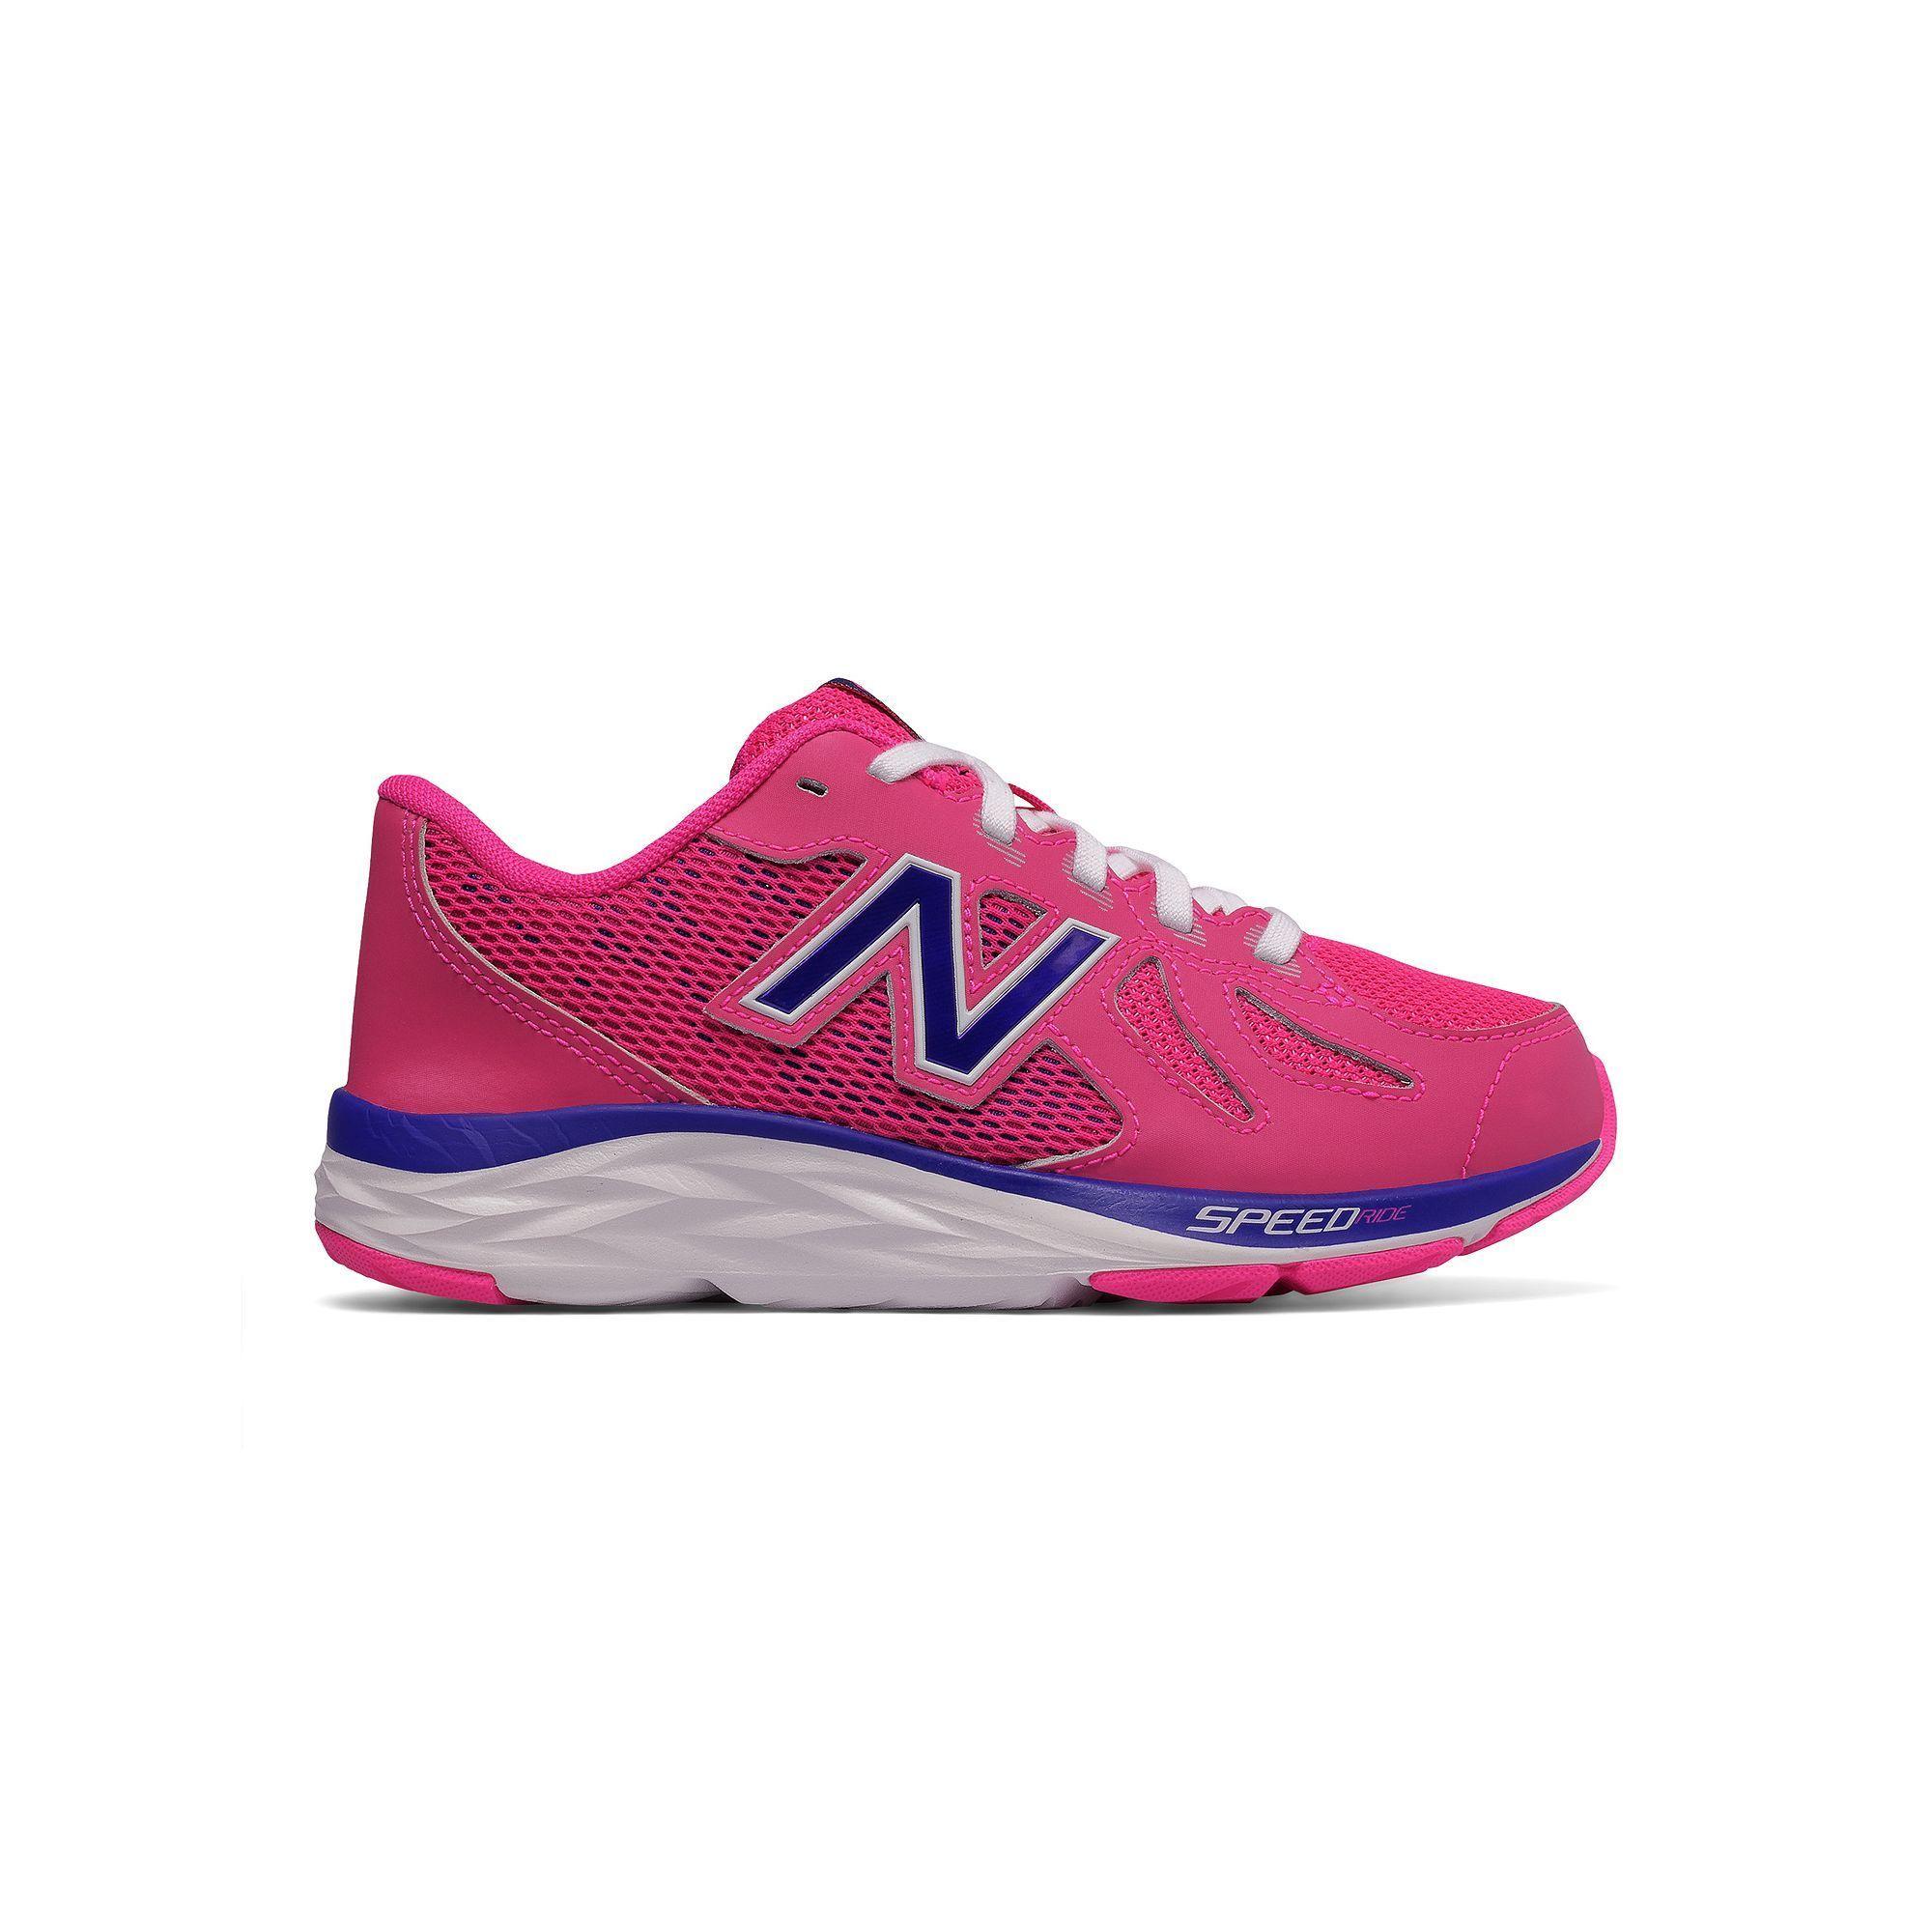 NEW Balance 790 V6 WOMEN'S Premium Scarpe Da Corsa Palestra Fitness Scarpe da ginnastica Pink